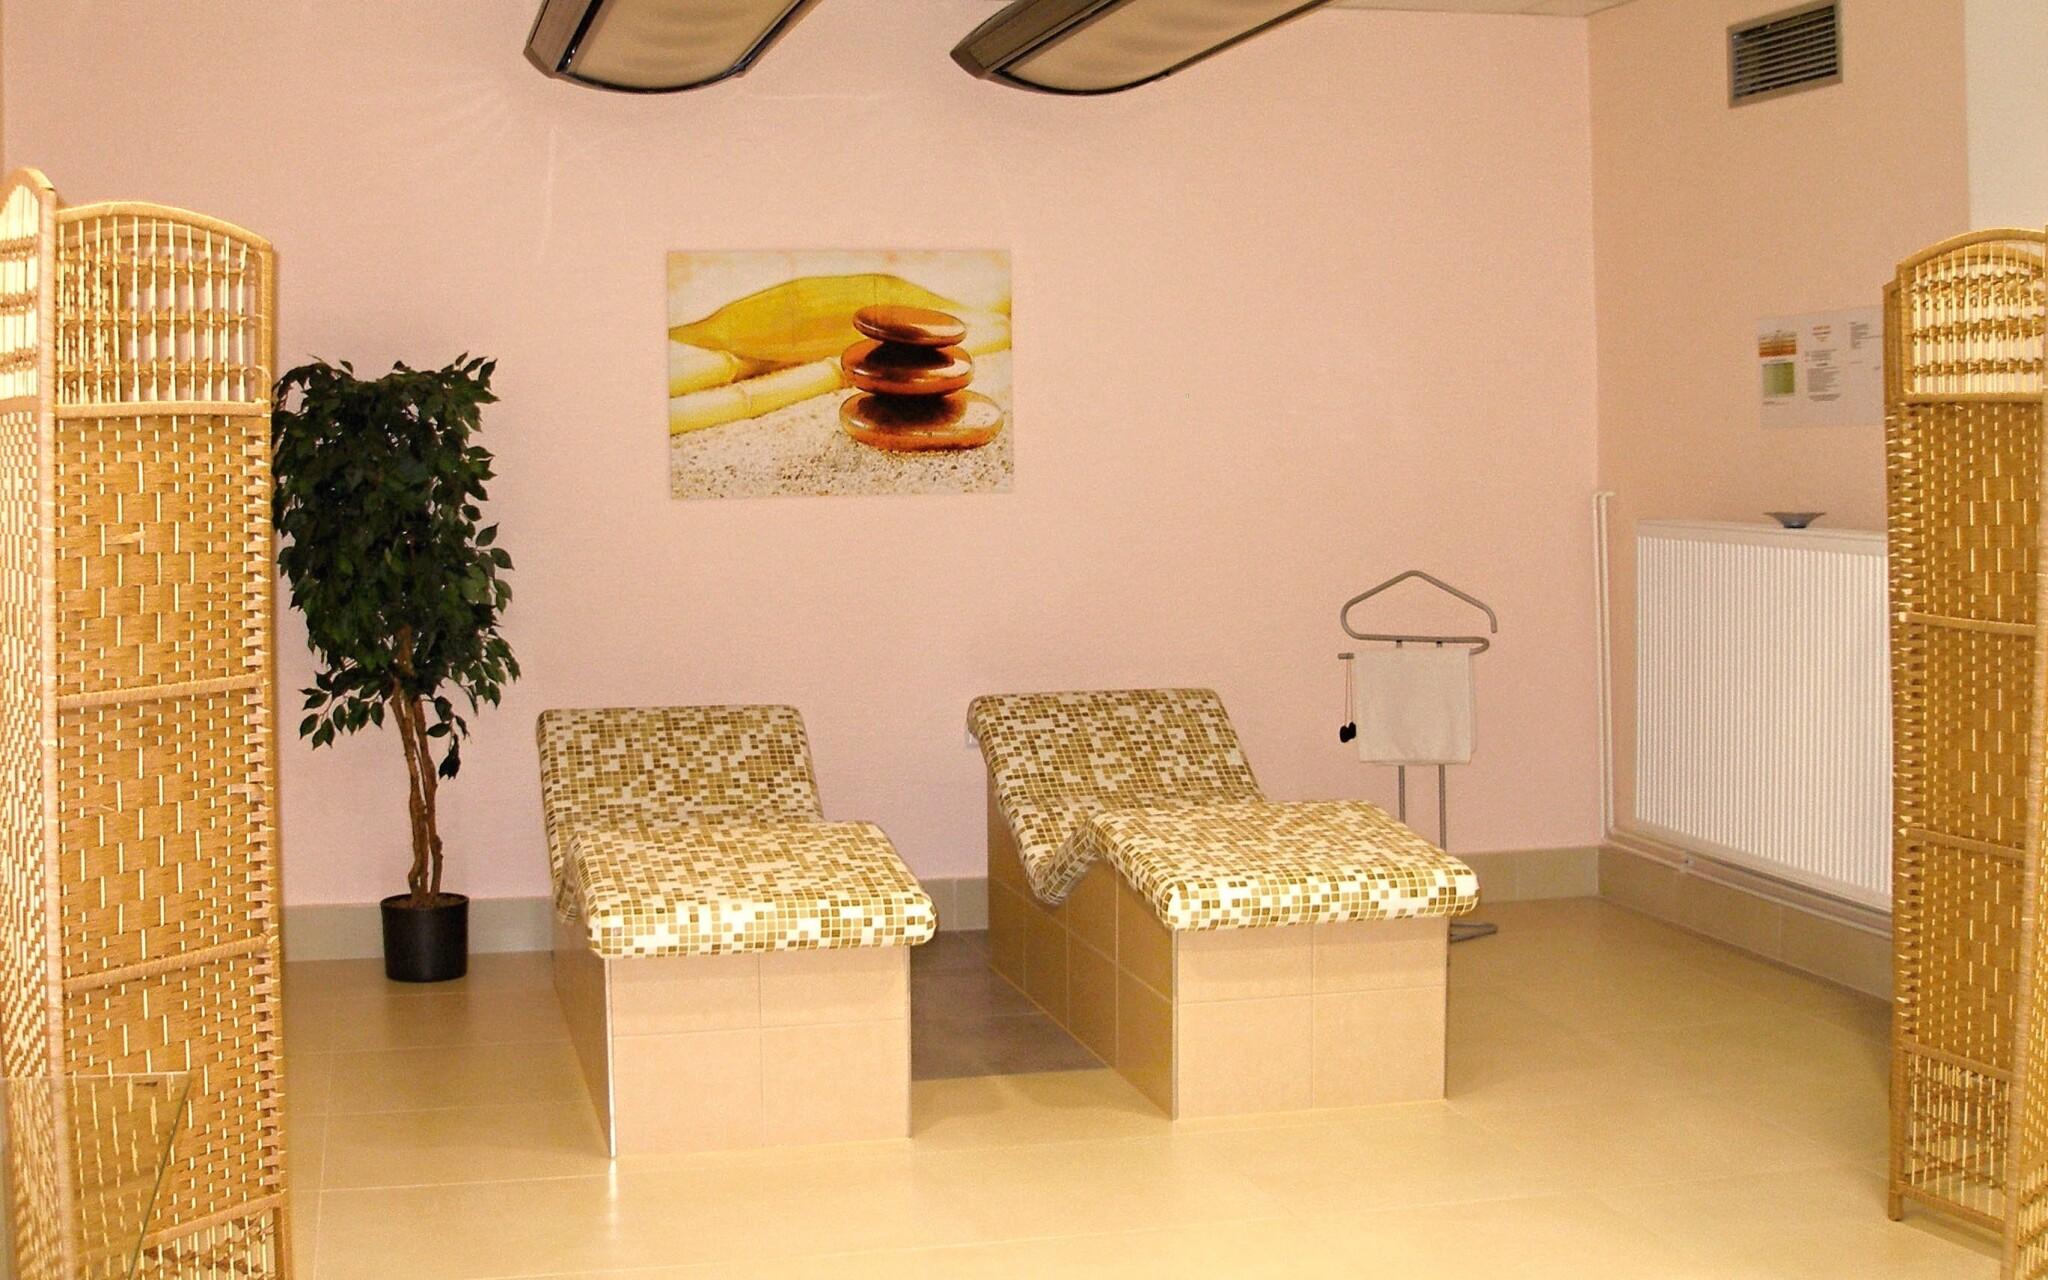 Uvoľníte sa pri procedúrach v Lázně Flora Olomouc